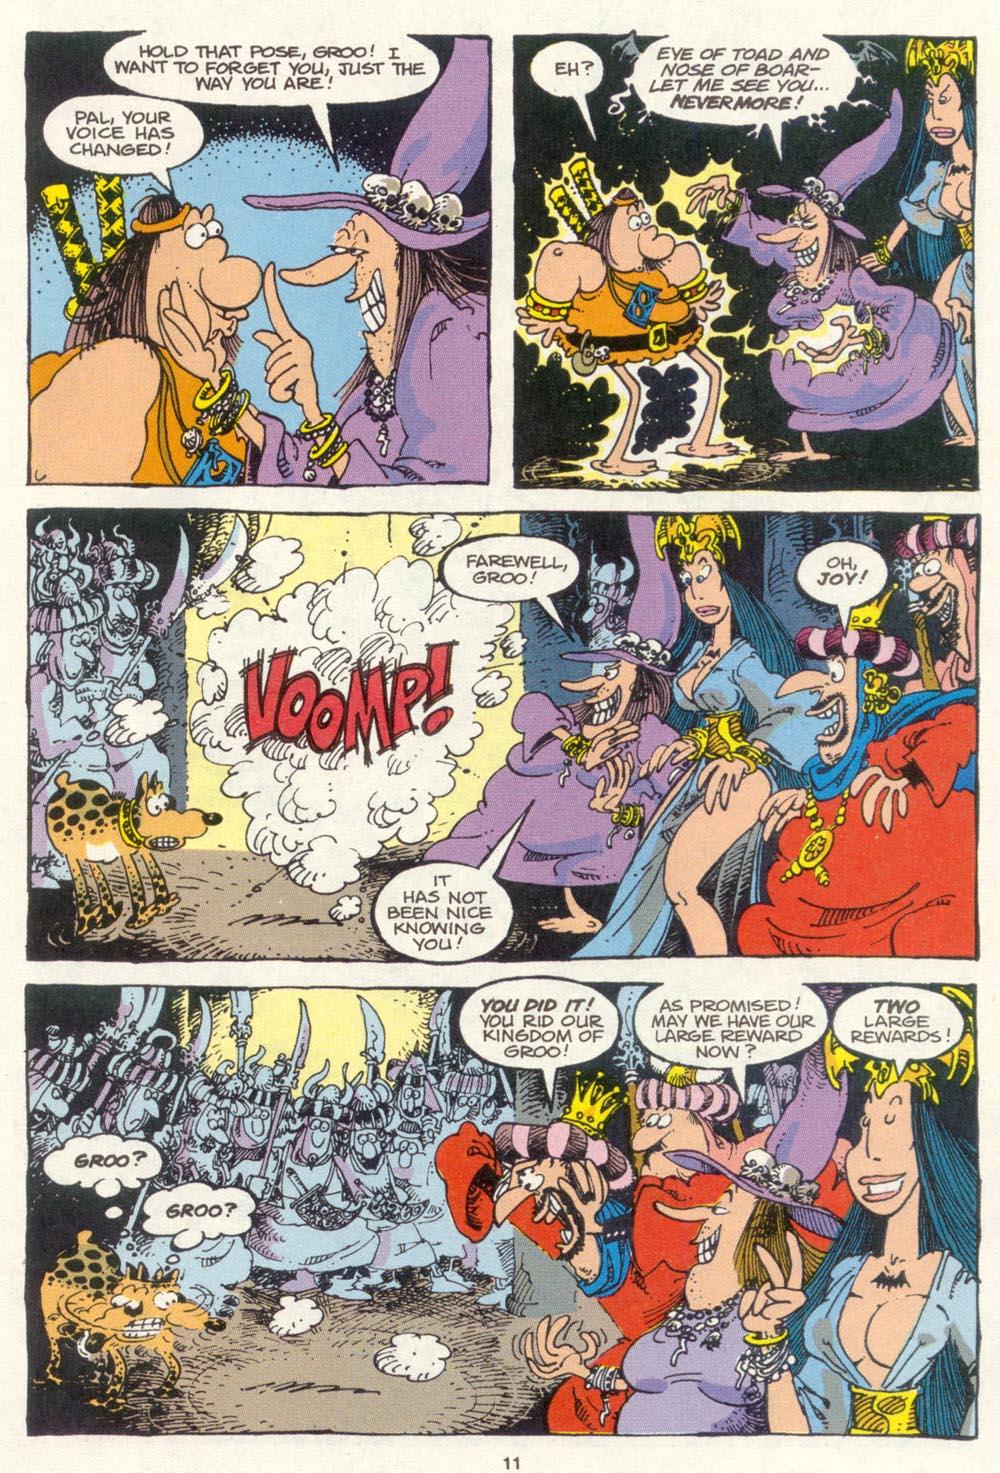 Read online Sergio Aragonés Groo the Wanderer comic -  Issue #85 - 9